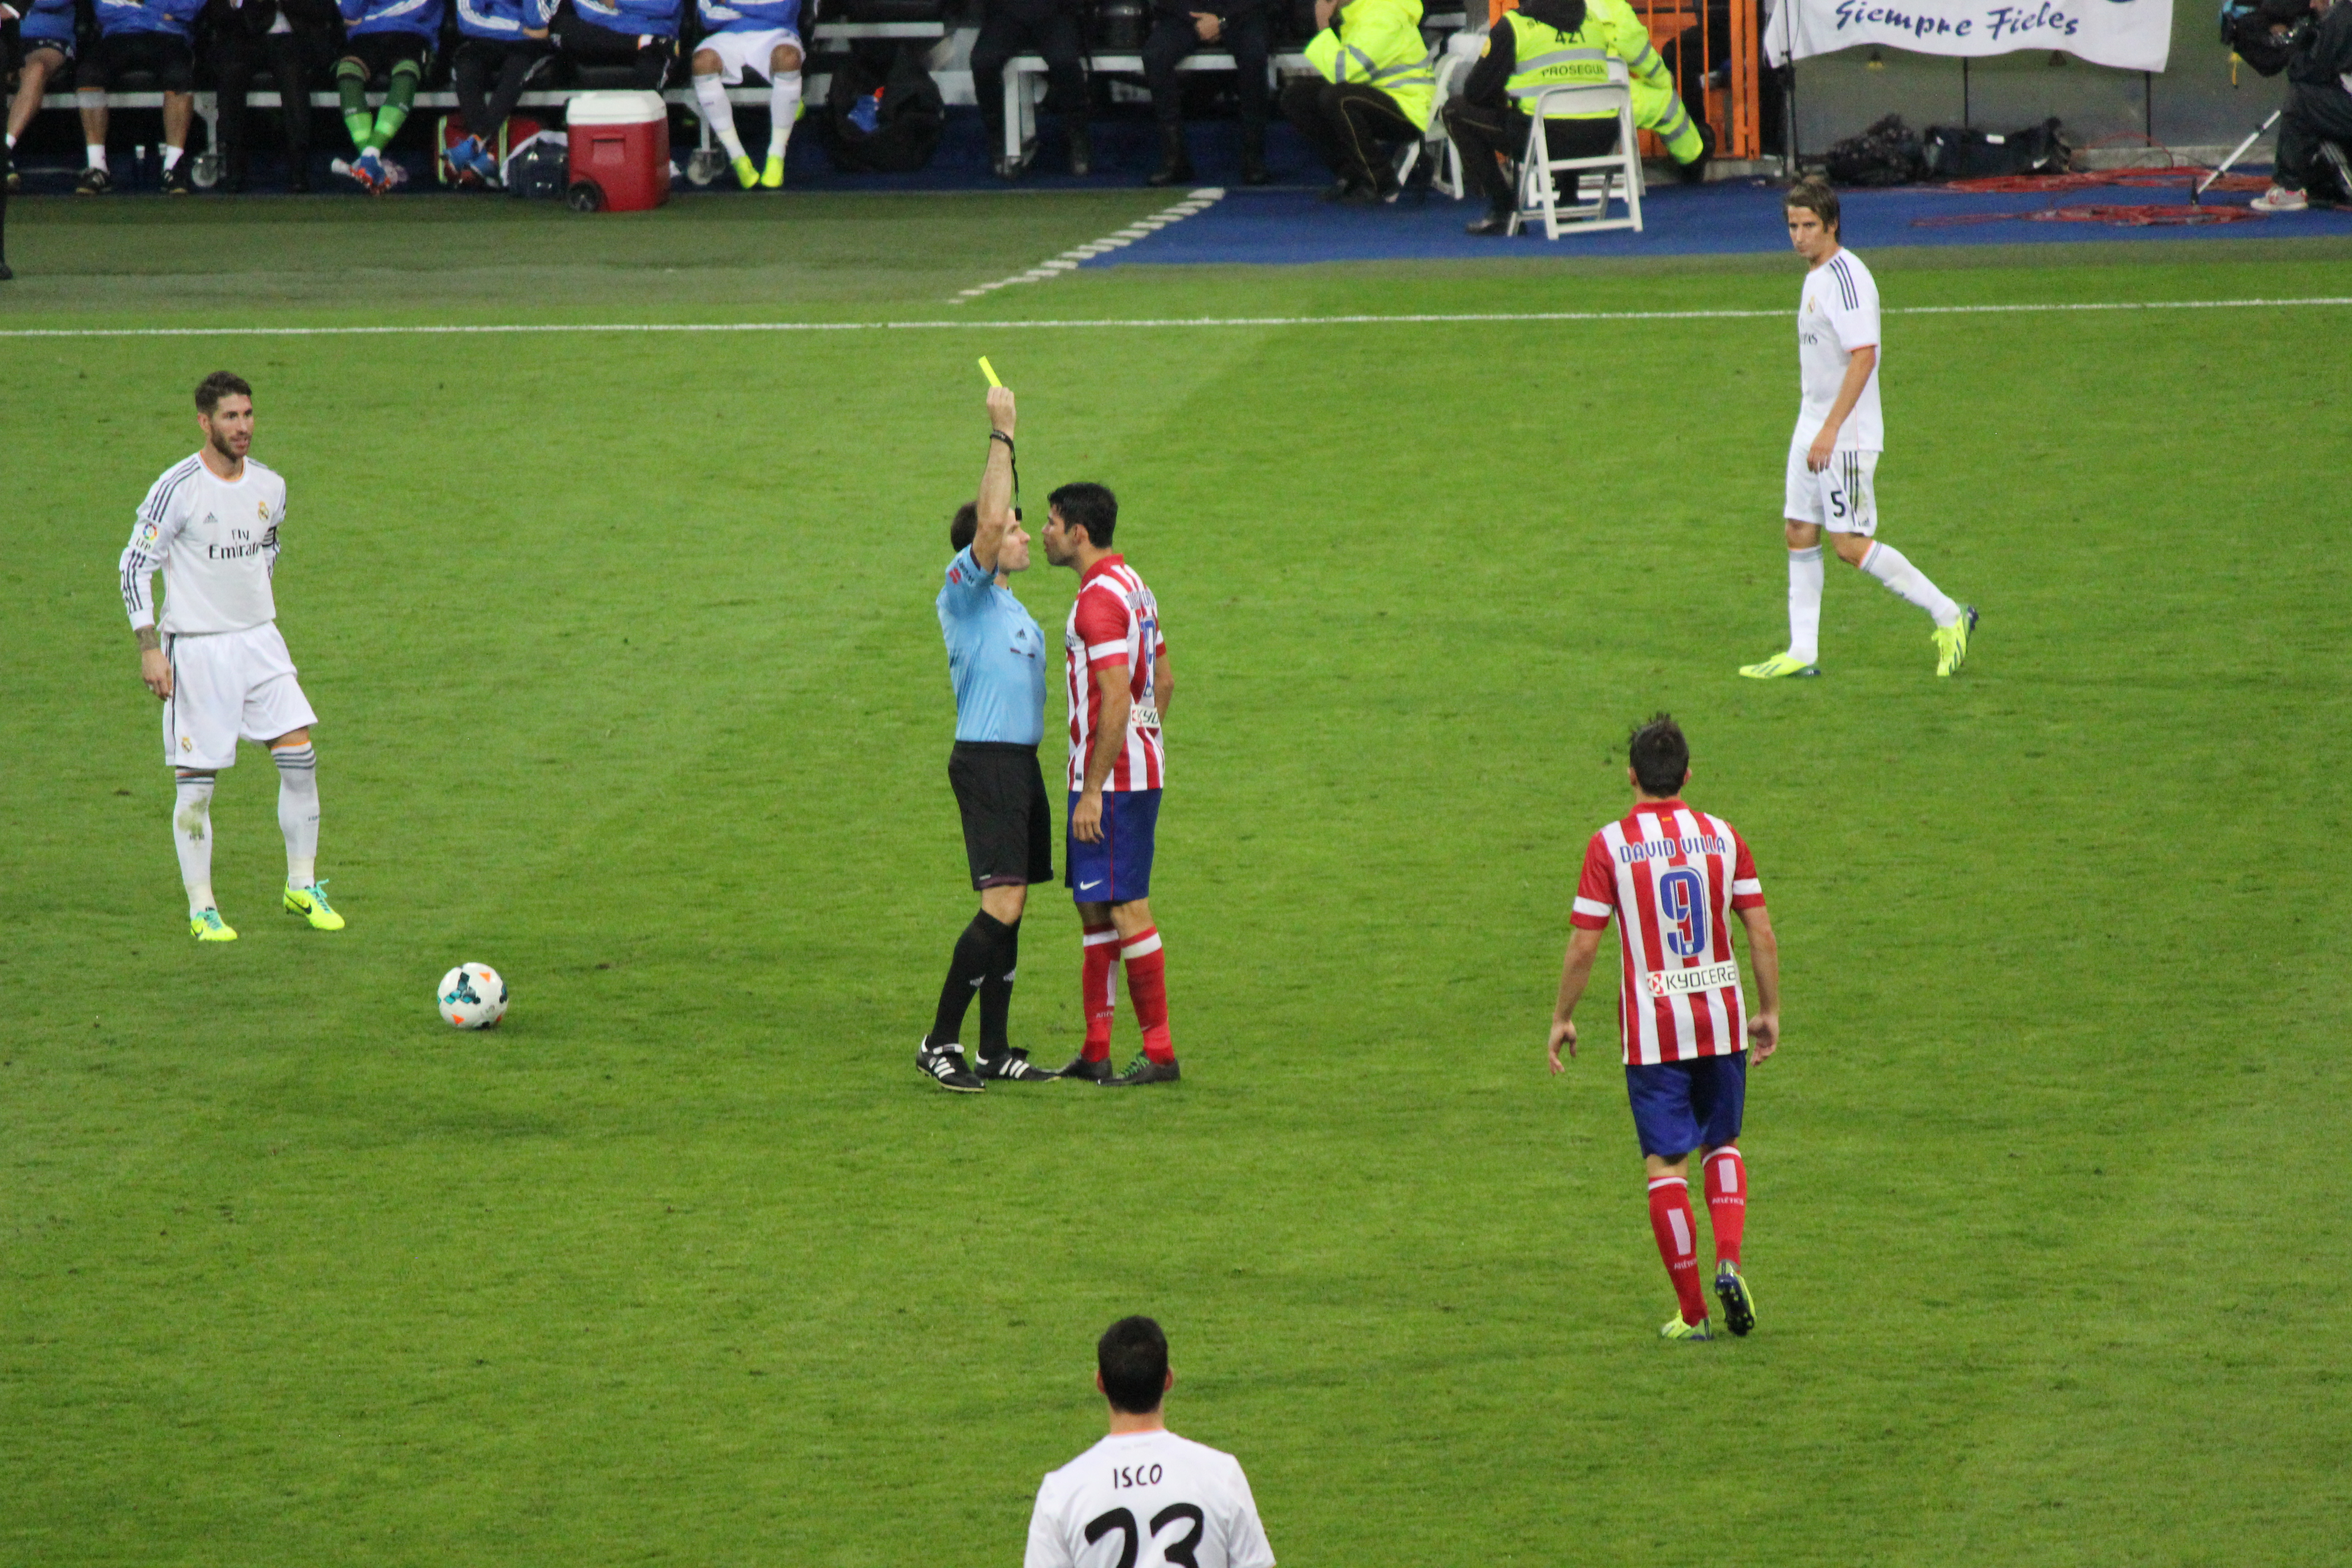 Image Result For Vivo Real Sociedad Vs Barcelona En Vivo Champions League Final Full Match Download